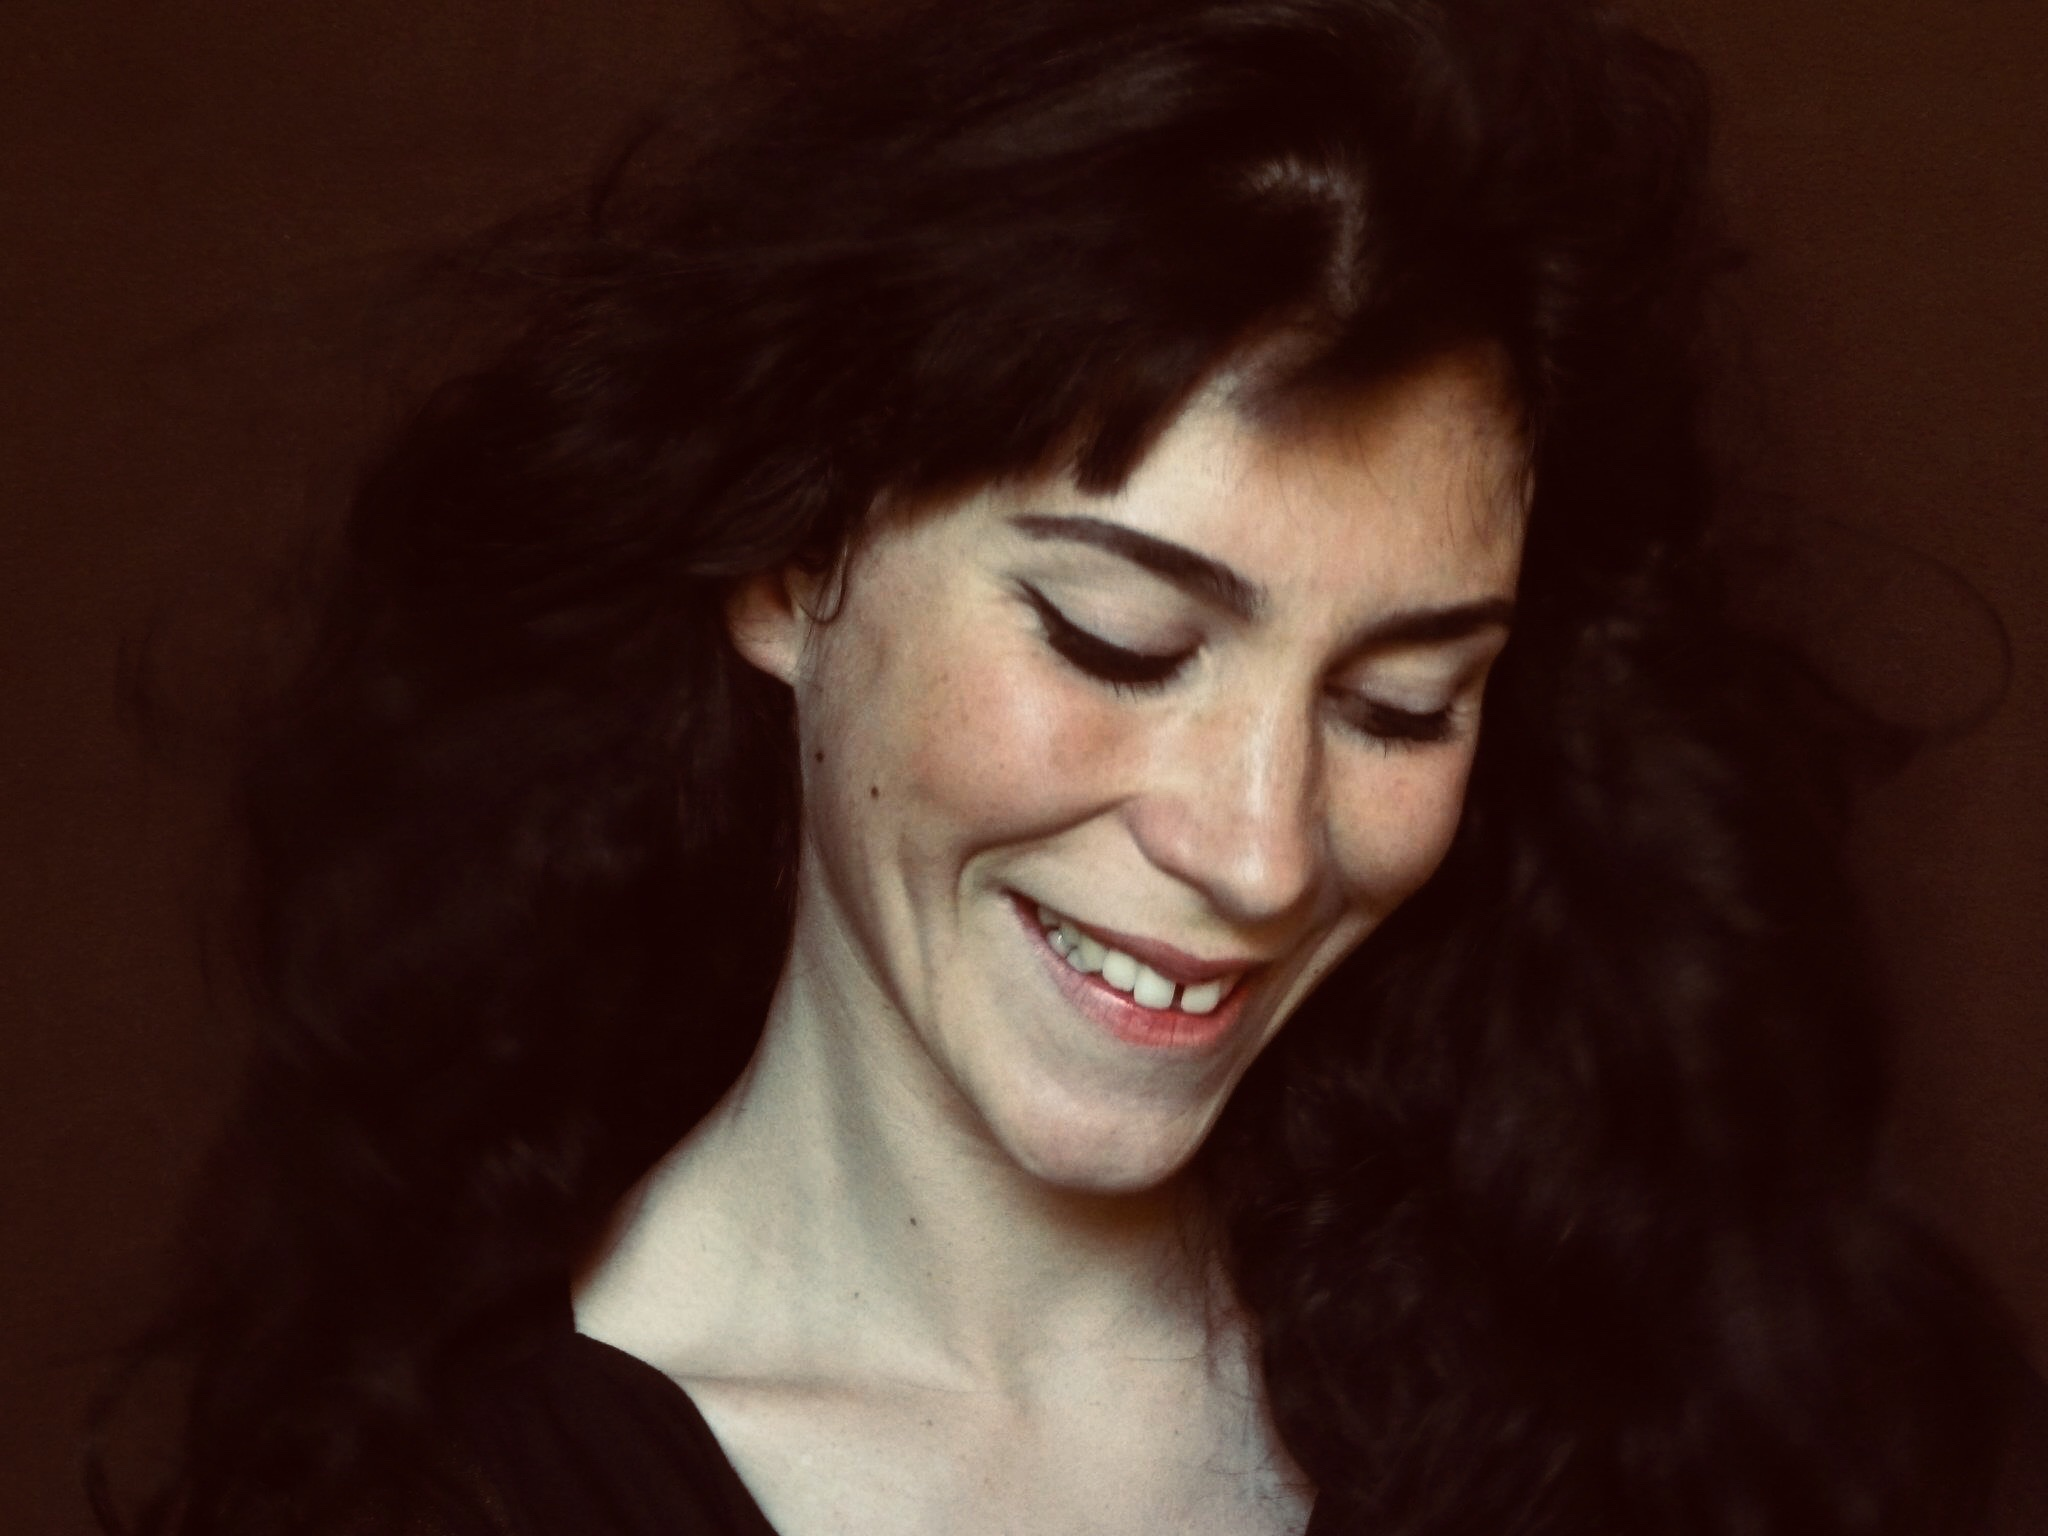 anna d'annunzio - les classiques (16)